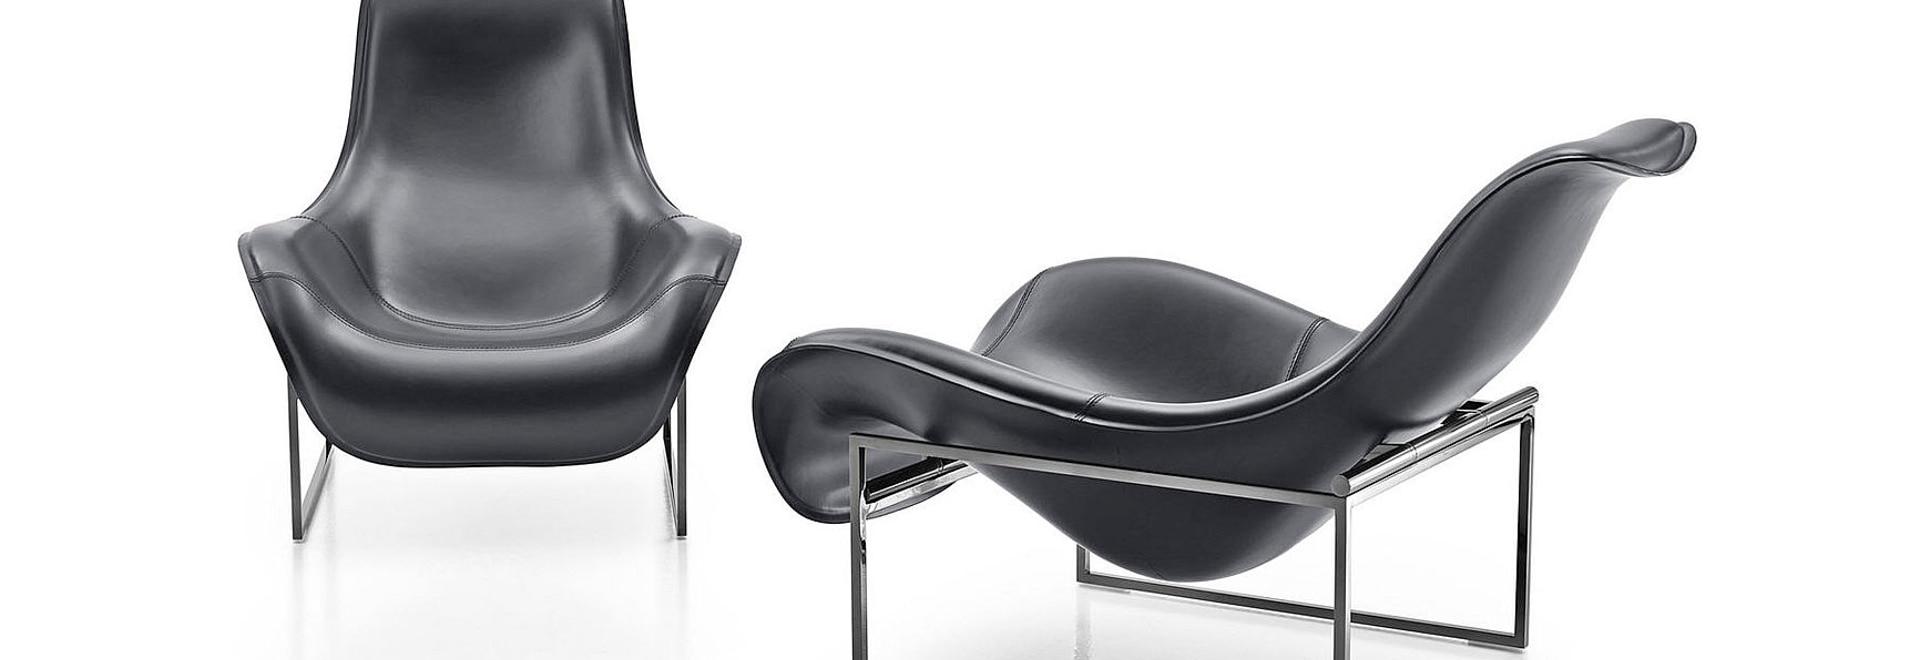 NEW: sled base armchair by B&B Italia